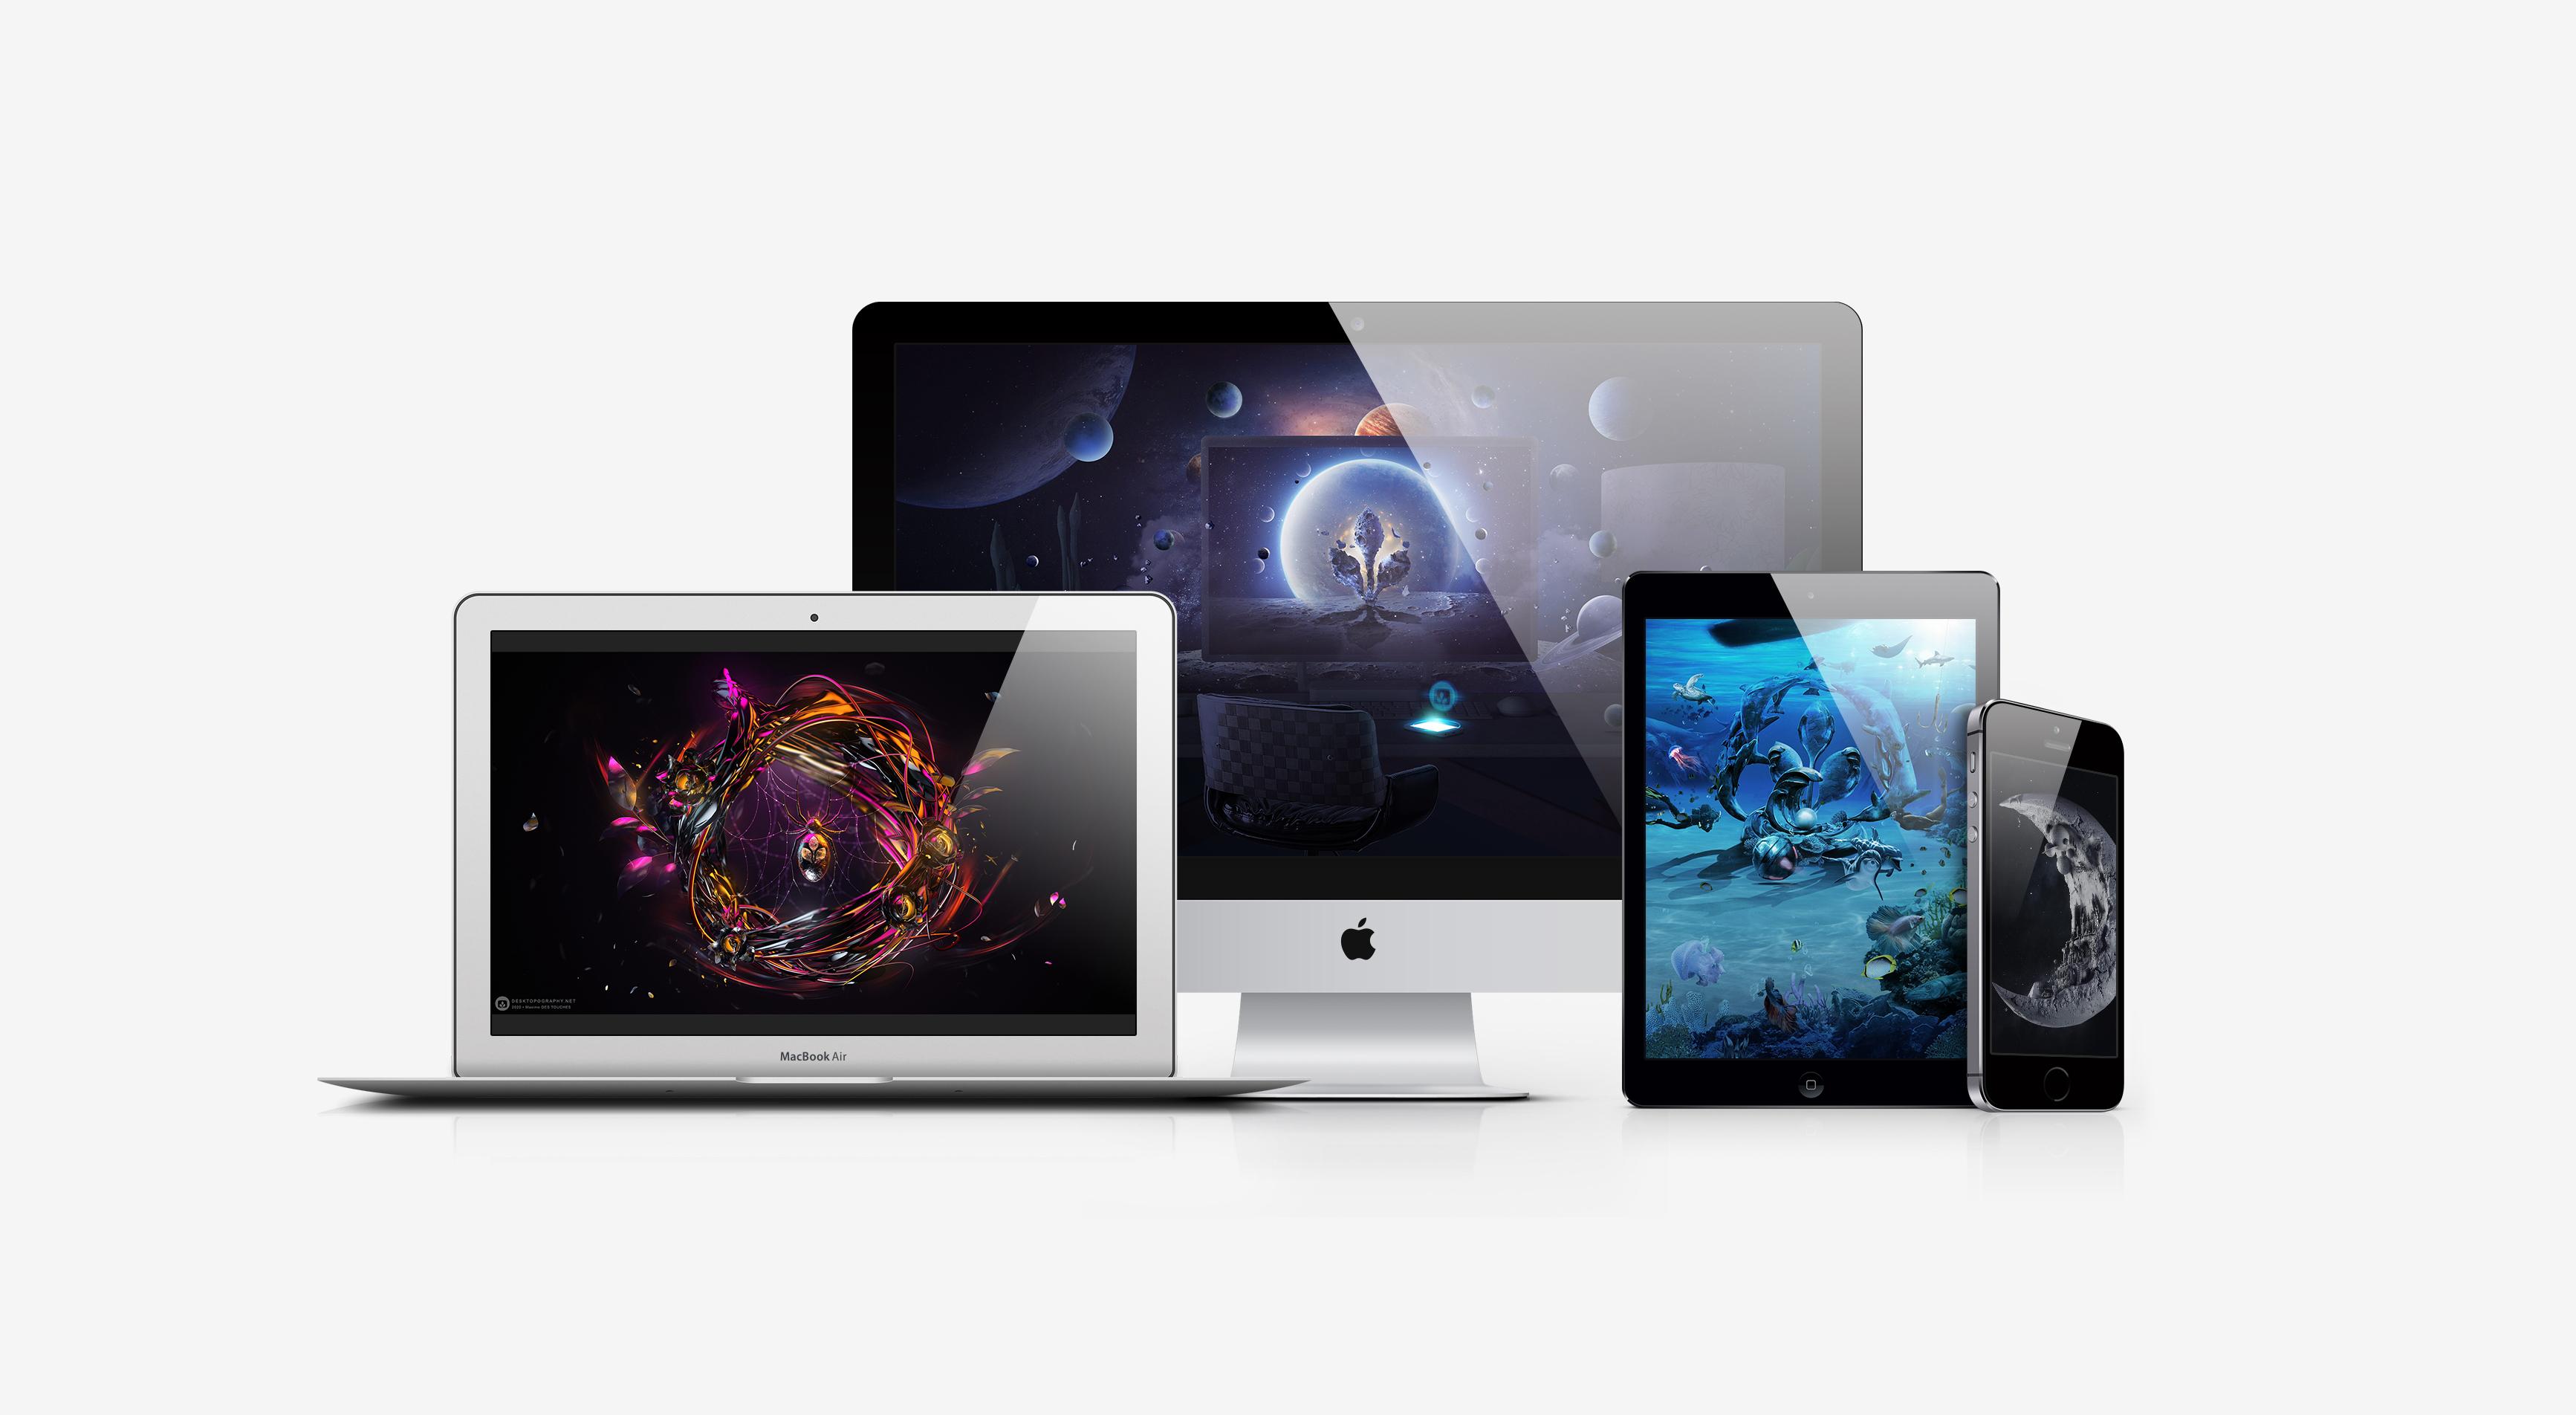 Desktopography 2011